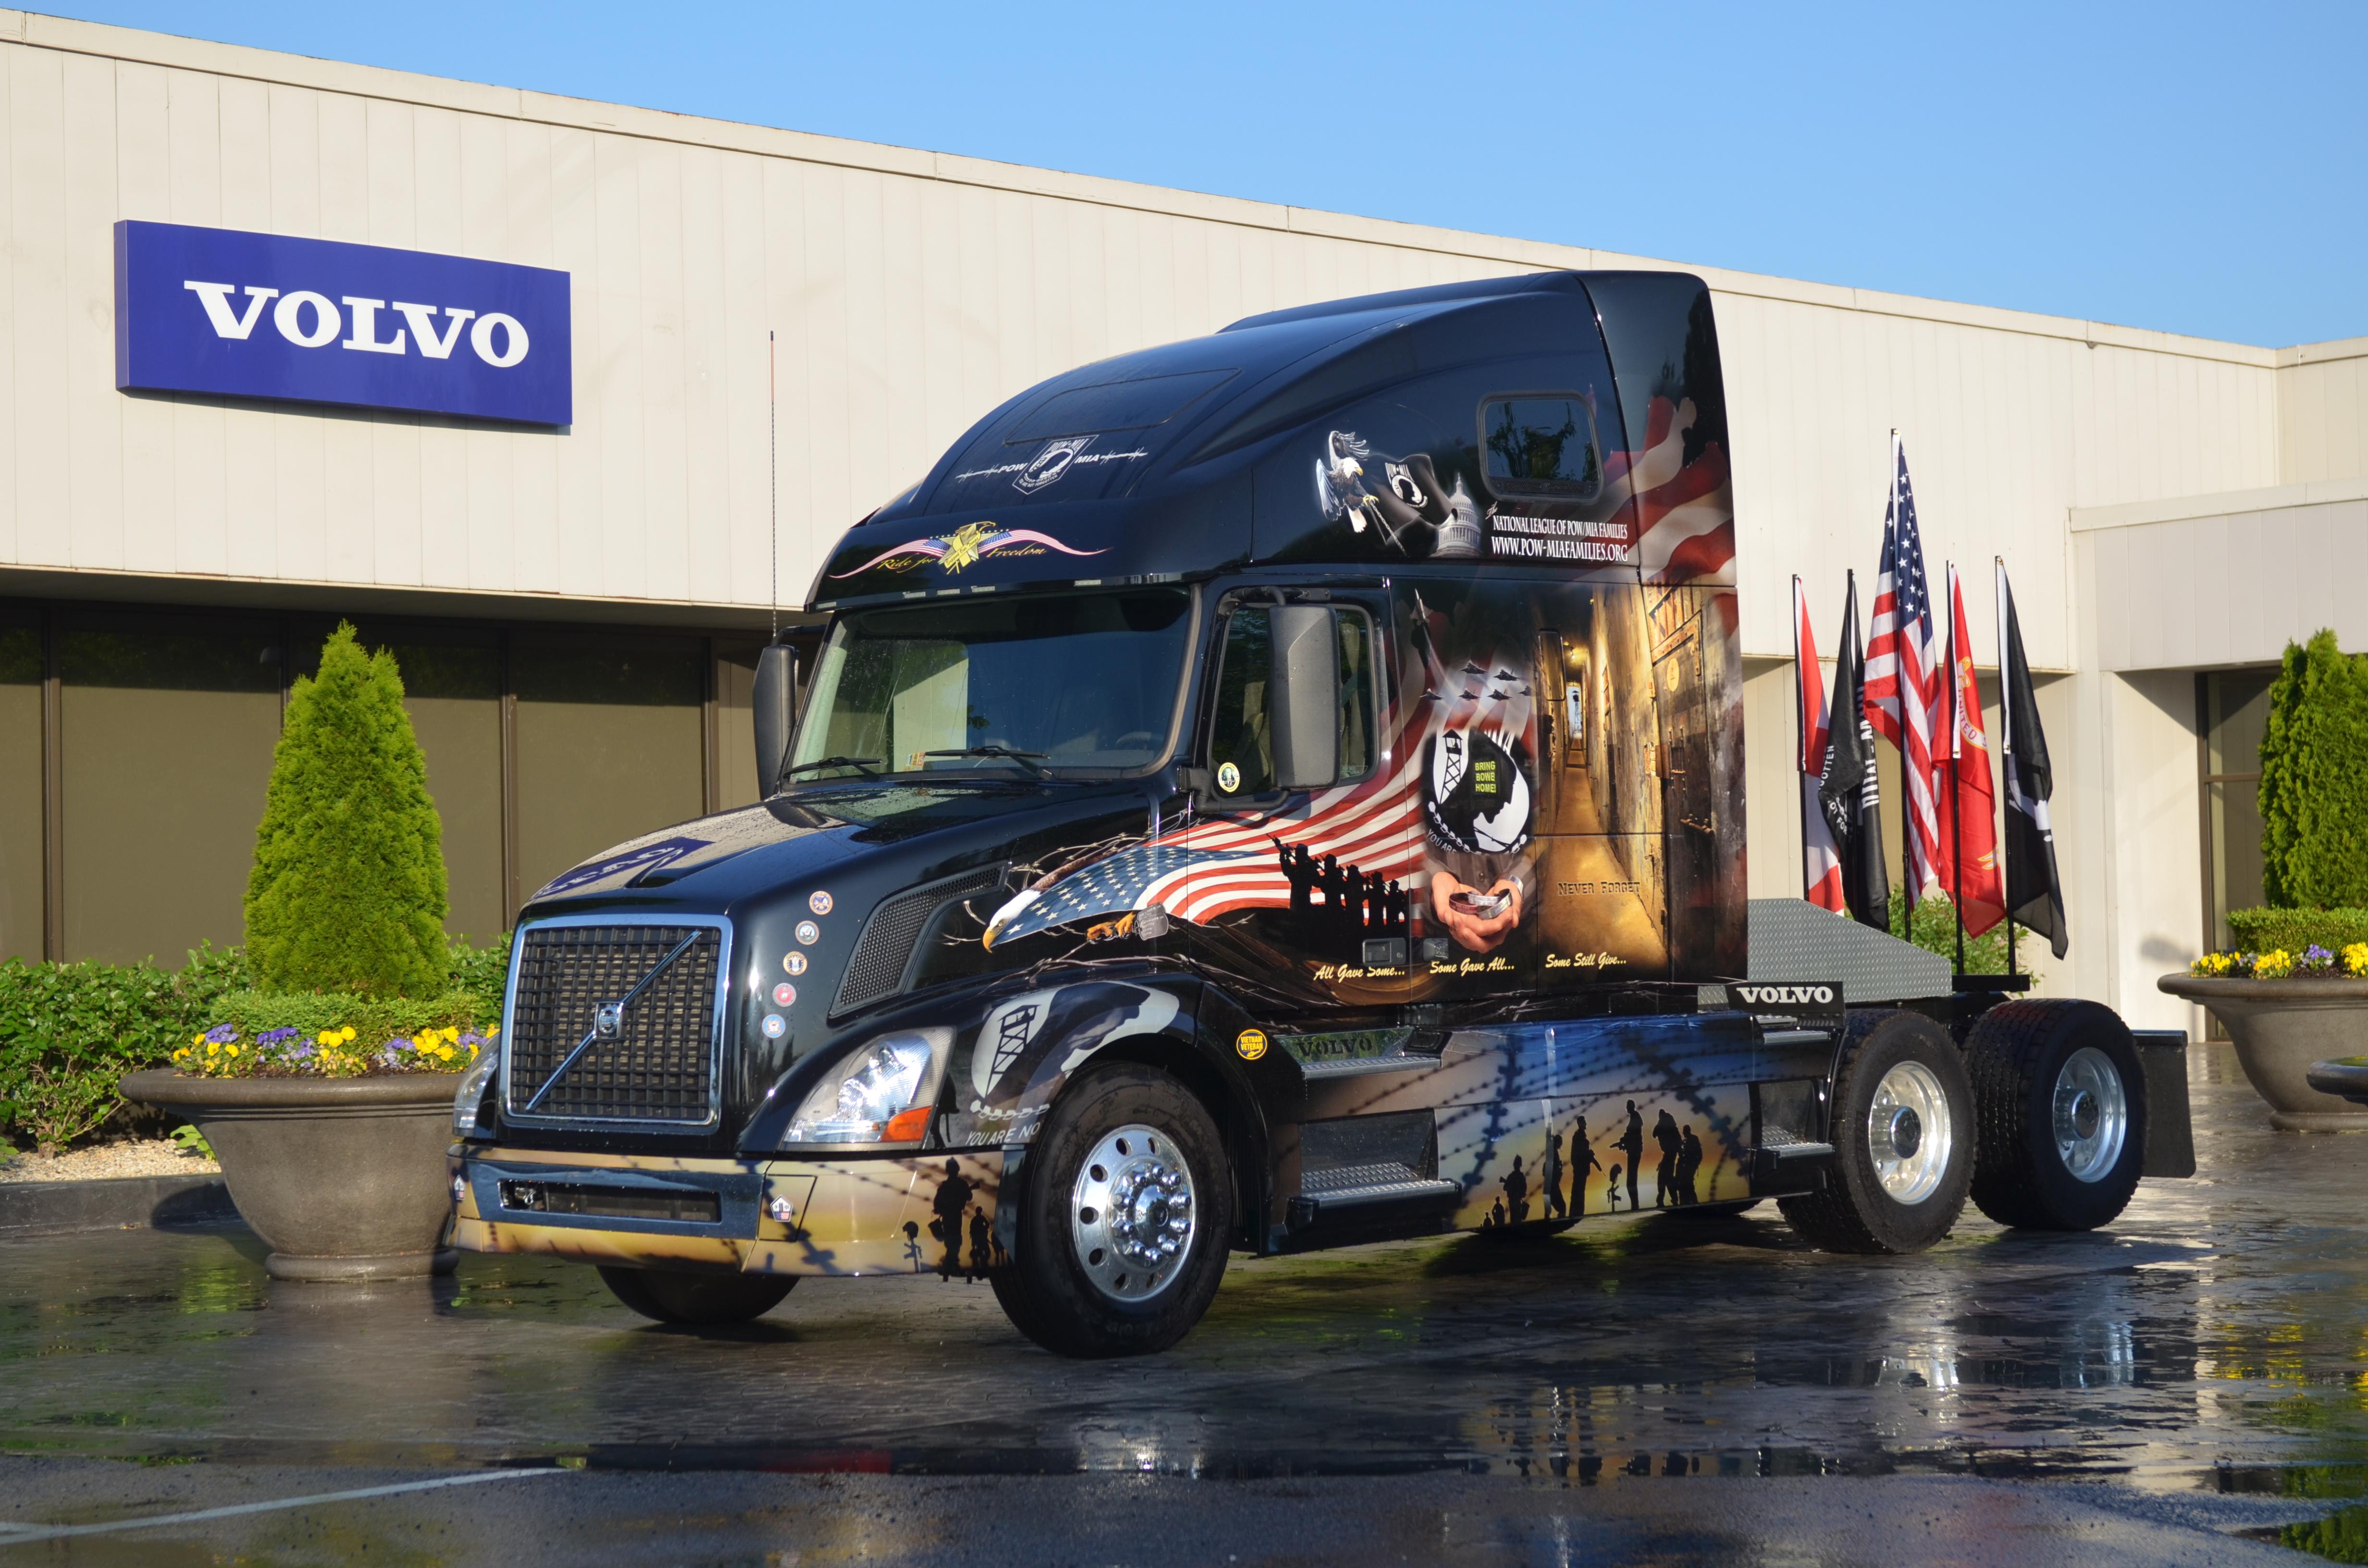 Custom Volvo Truck 4k Ultra HD Wallpaper And Background Image